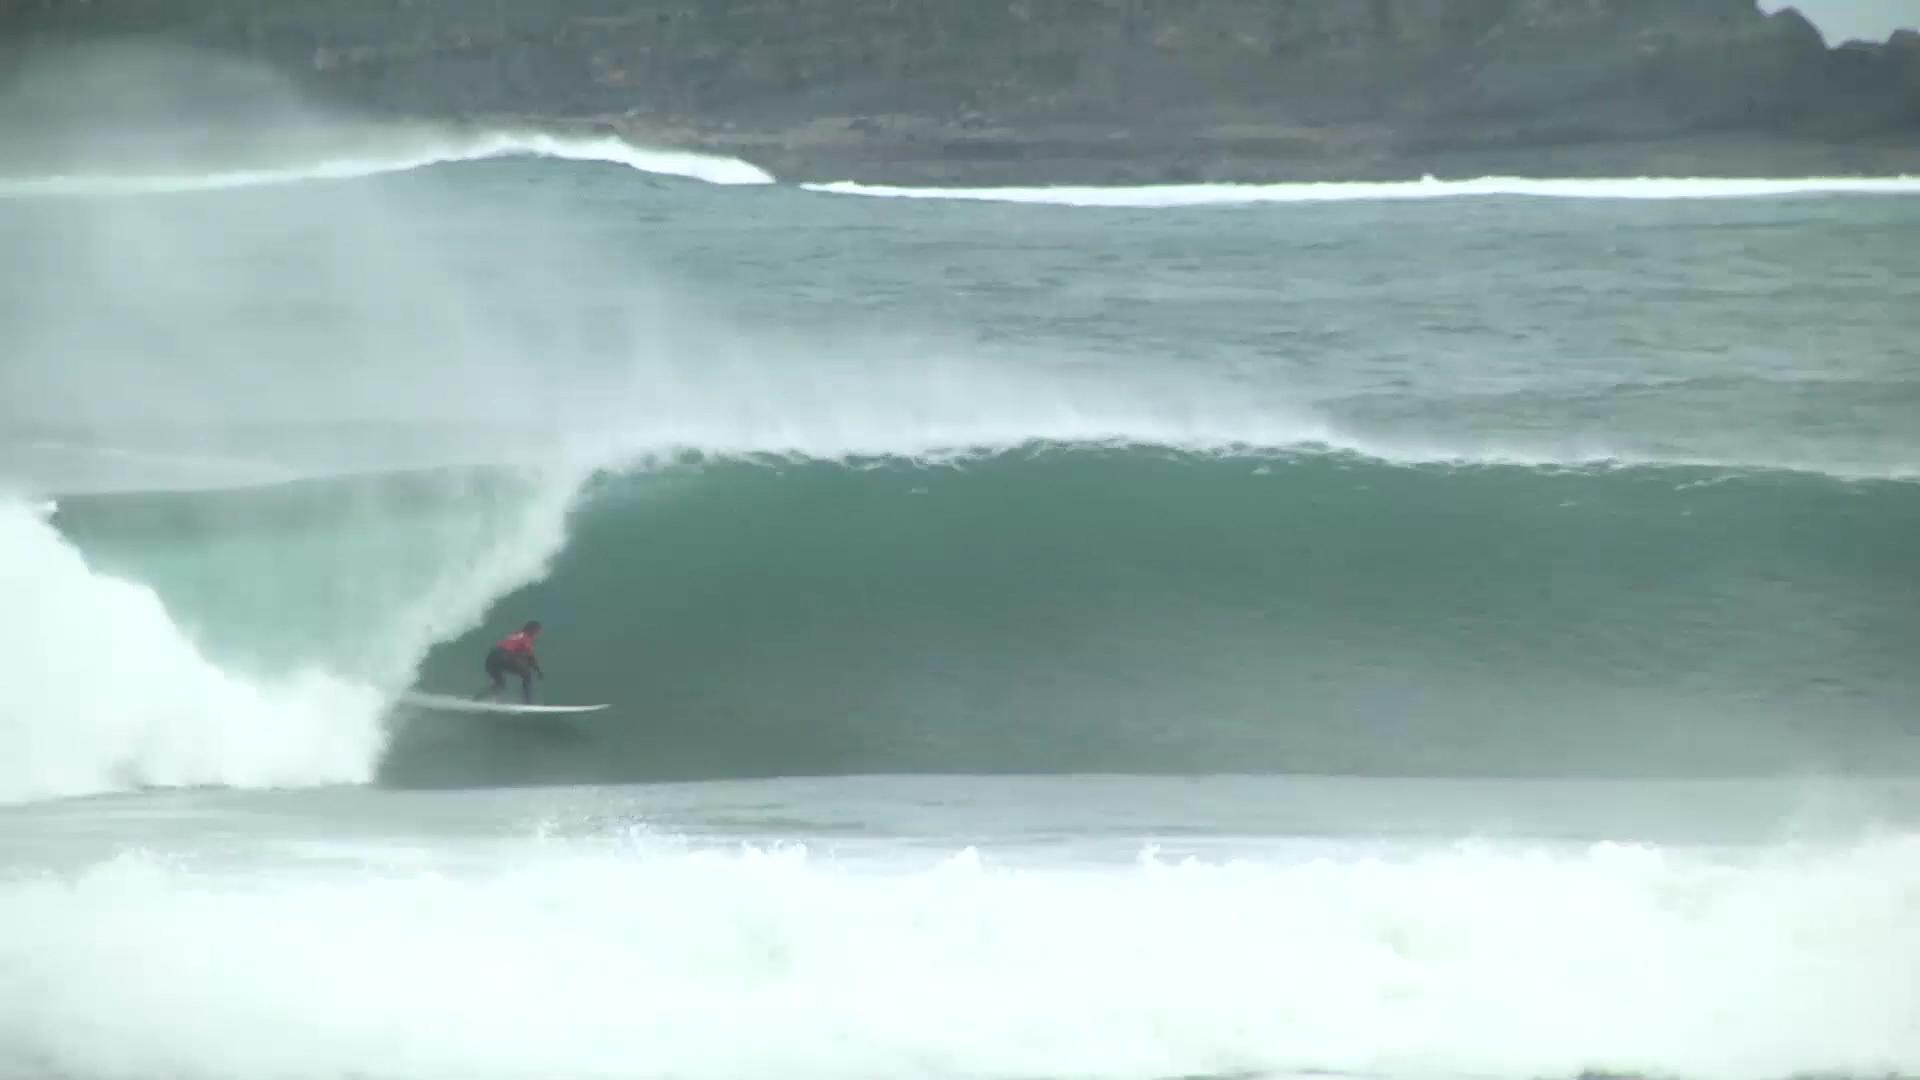 Big Wave in the Basque Country Ingles, with Laurels. Azkena Carrascon.MP4.Imagen fija010.jpg